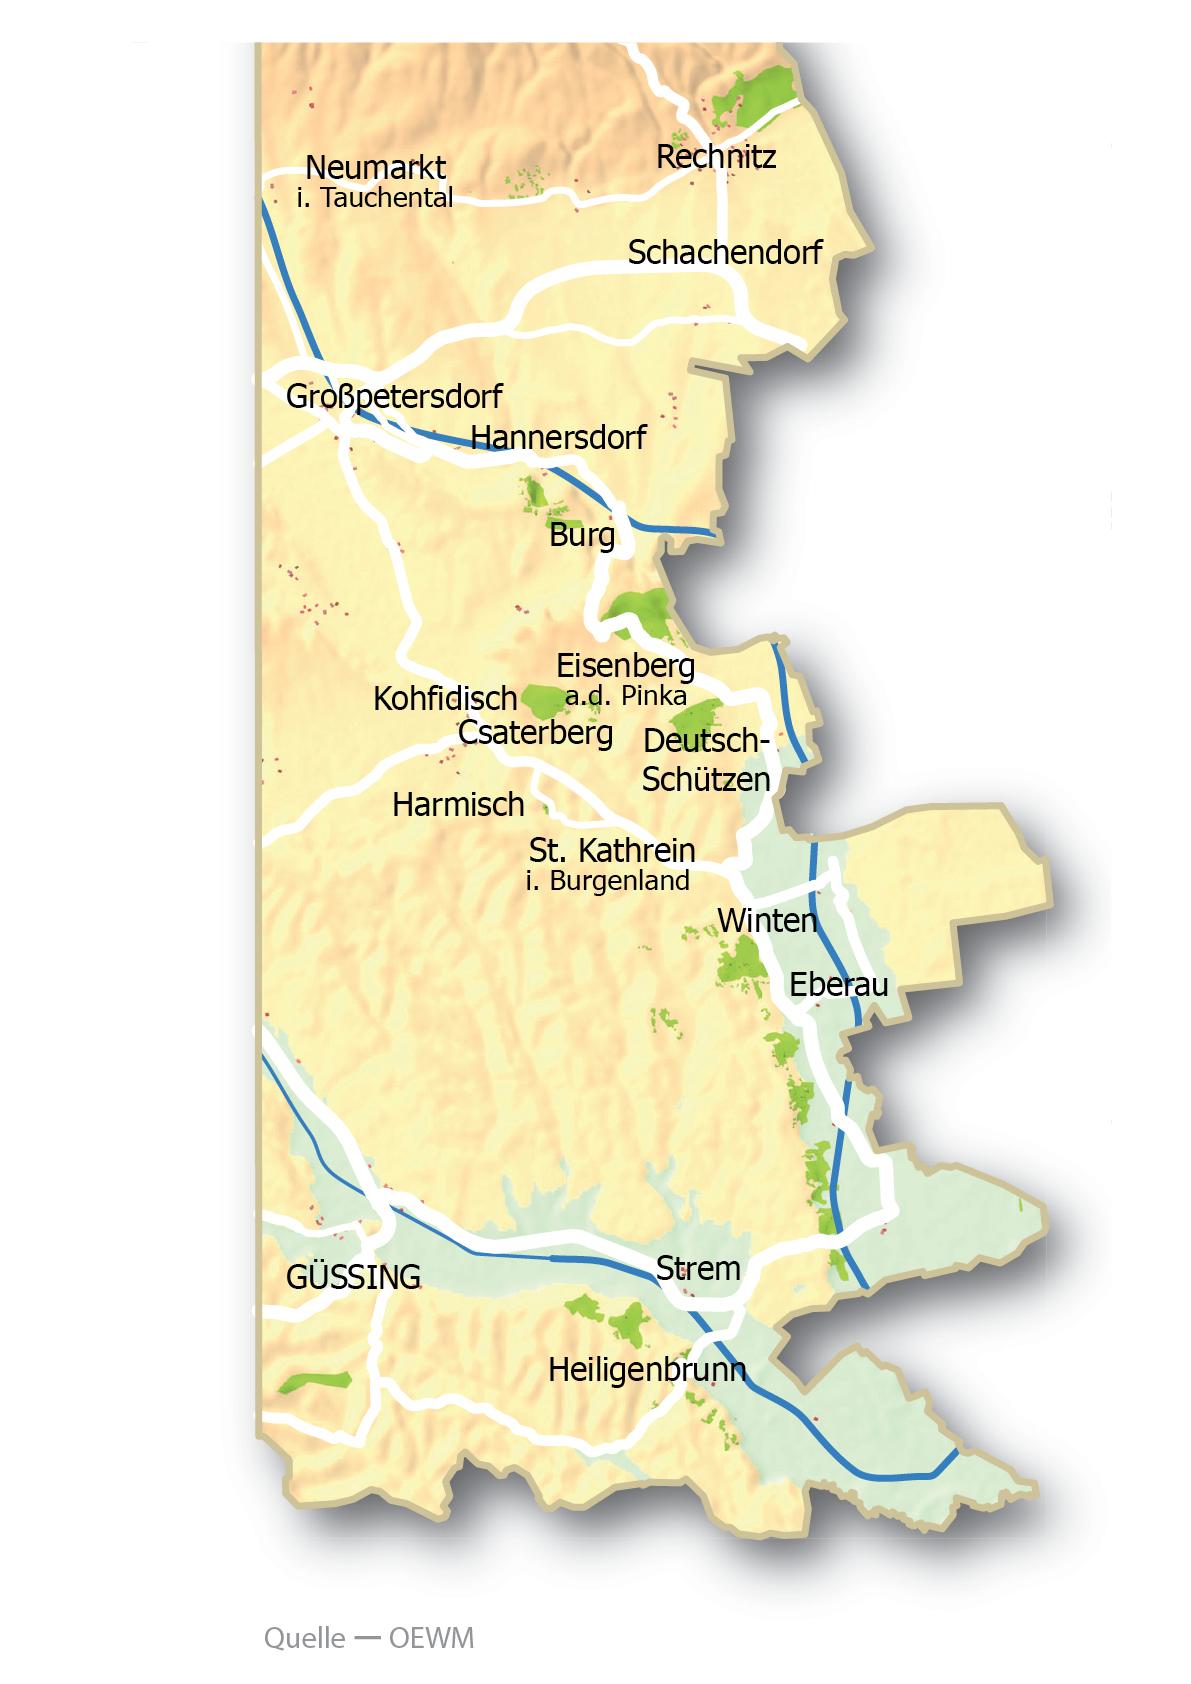 http://www.eisenberg-dac.at/wp-content/uploads/2017/02/infomappe-karte-de-region-3.jpg